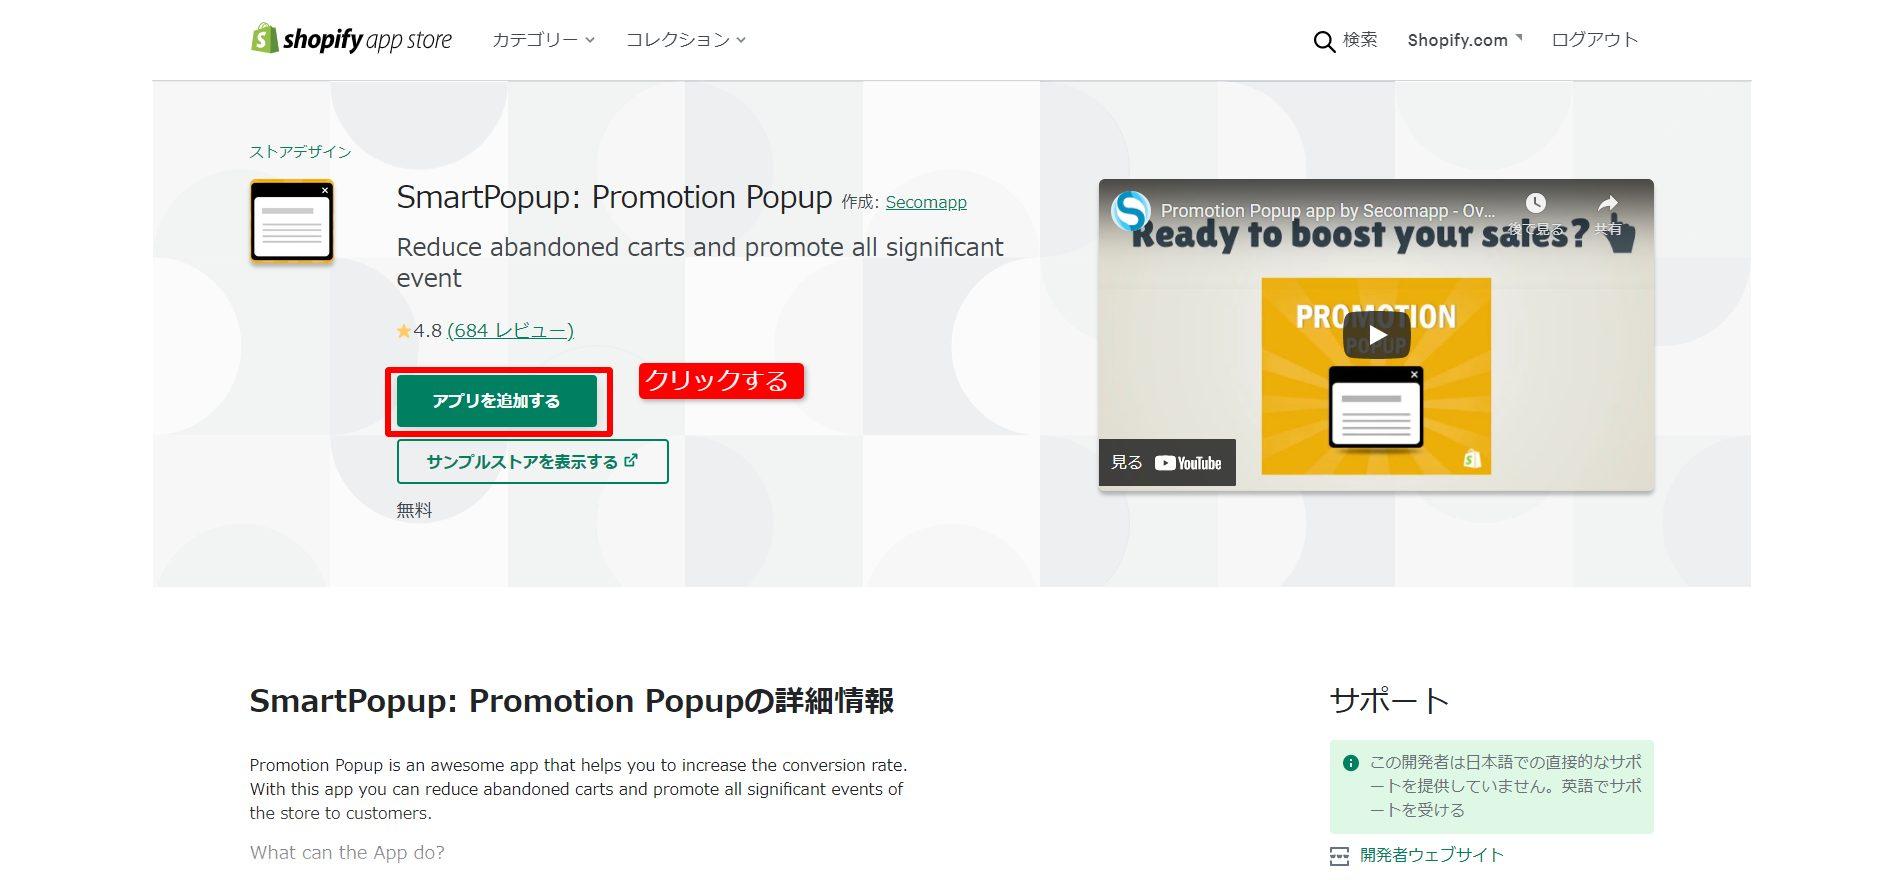 SmartPopup: Promotion PopupのShopifyアプリストアからインストールする。